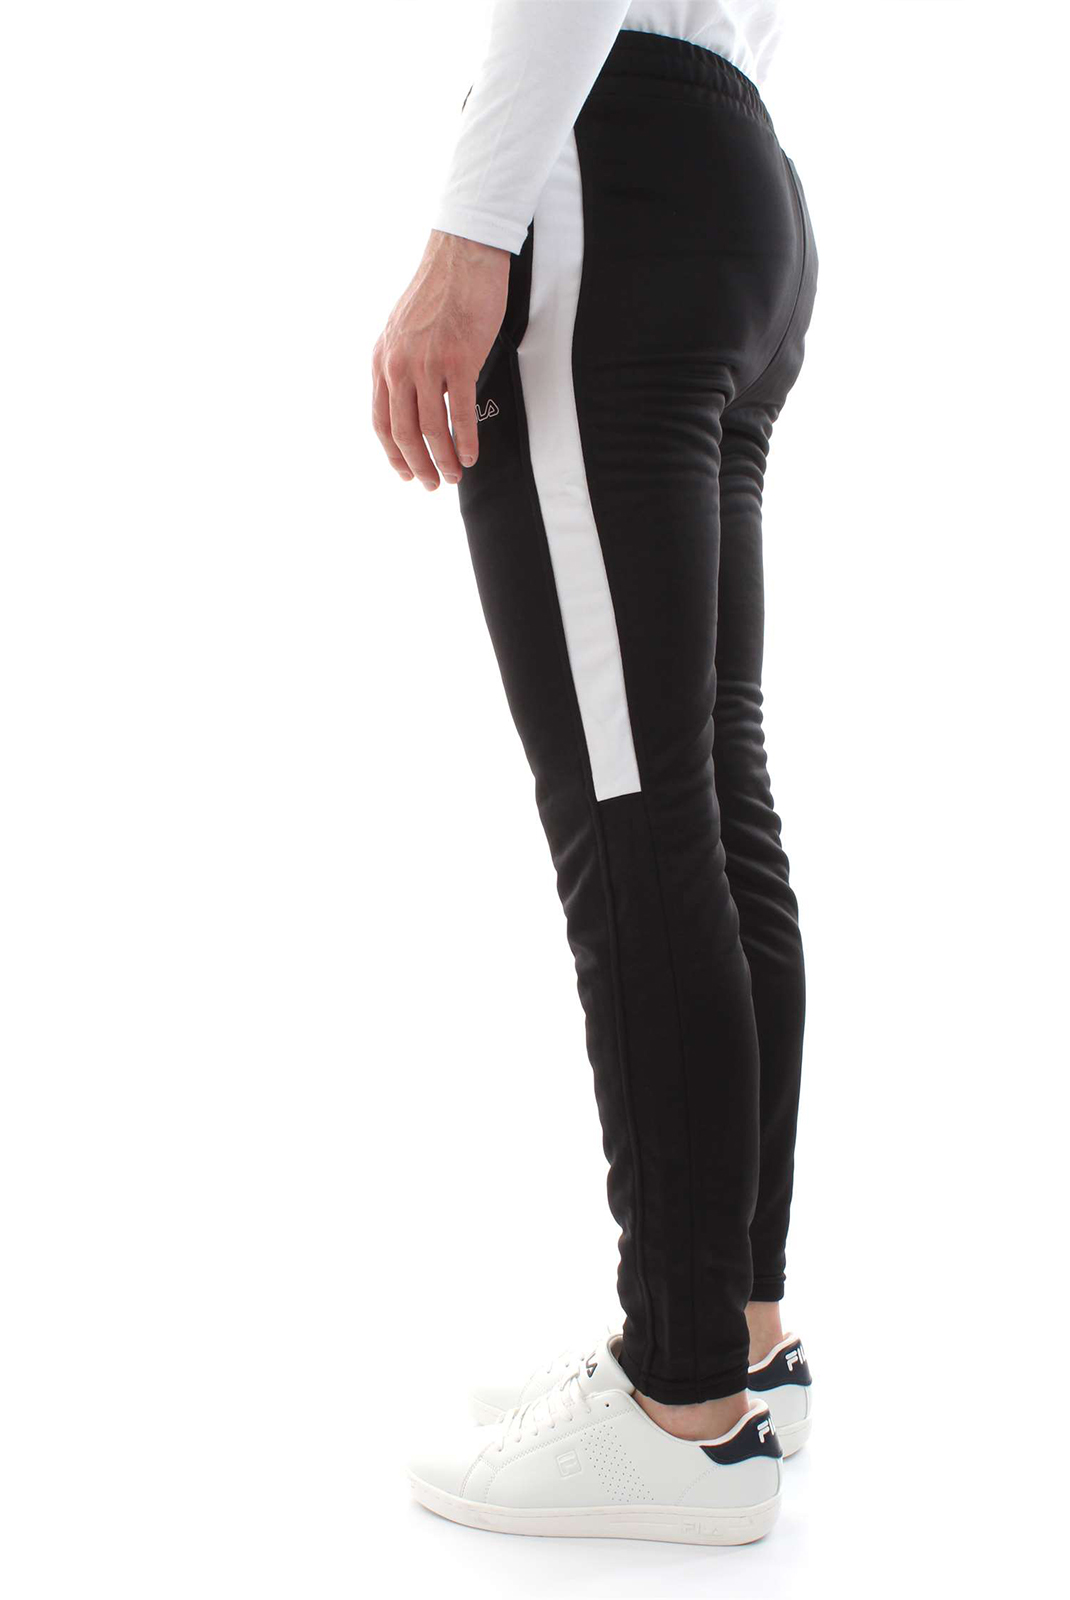 Pantalons sport/streetwear  Fila 682072 SOLAR TIGHT E09 black-bright white